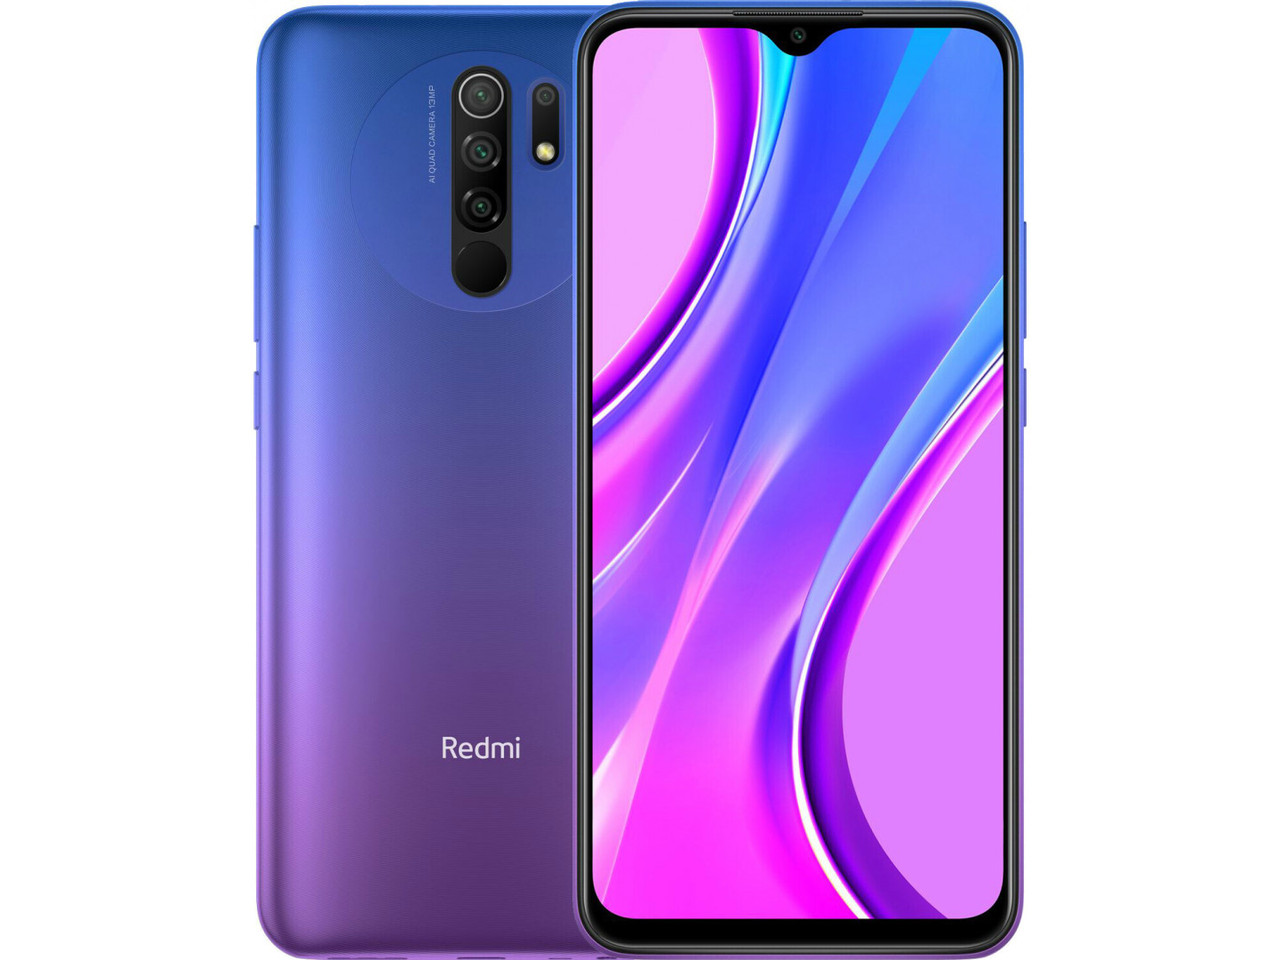 Redmi 9 3/32Gb (Sunset Purple)